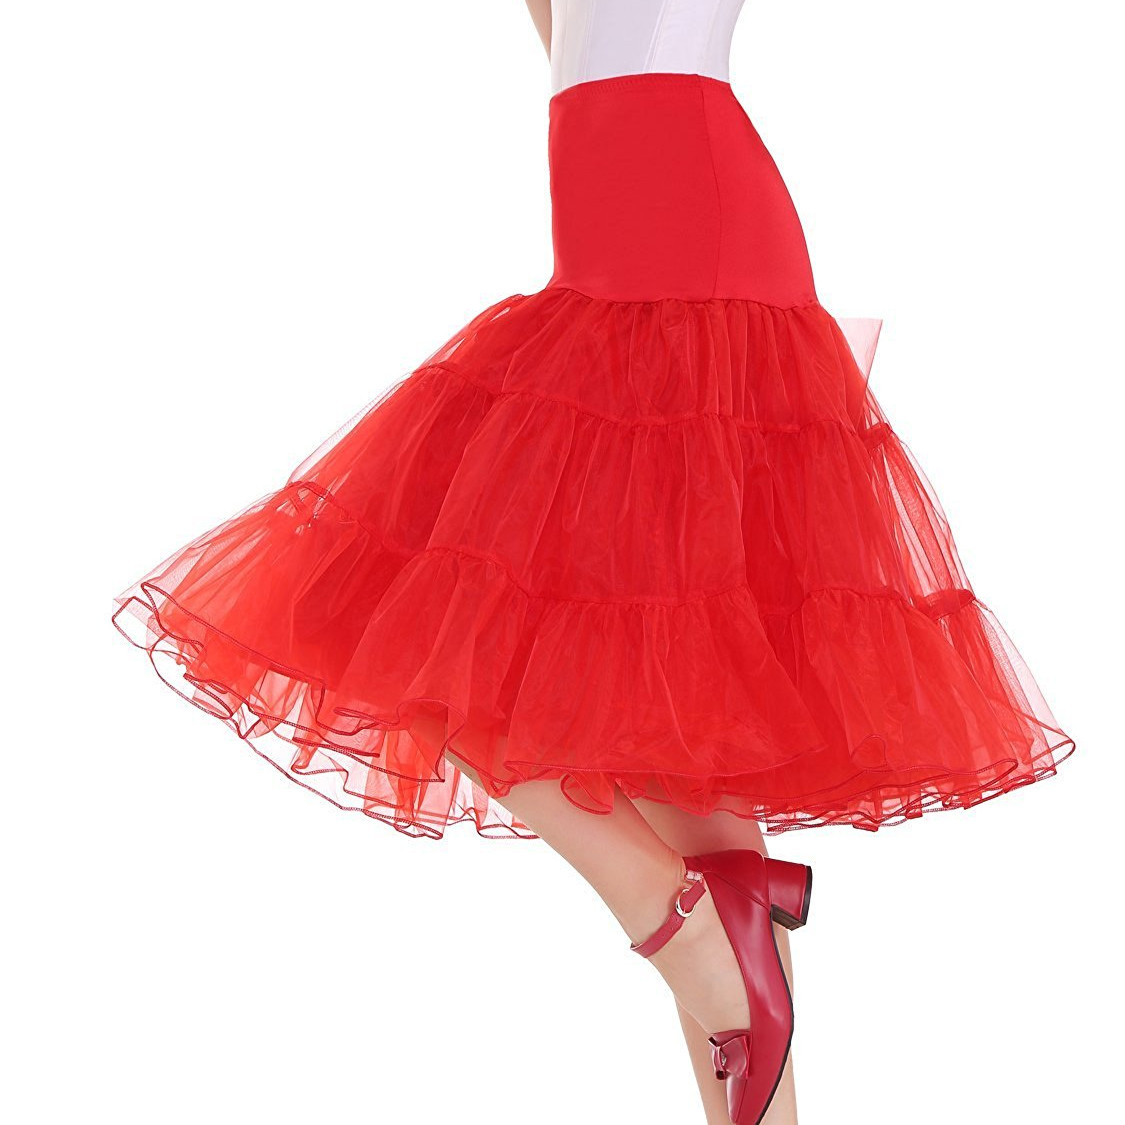 Plus Size Volie Rockabilly Petticoat Skirts Women Midi Tutu Vintage Underskirts Half Slips Crinoline Femme Saias 50s Party Prom